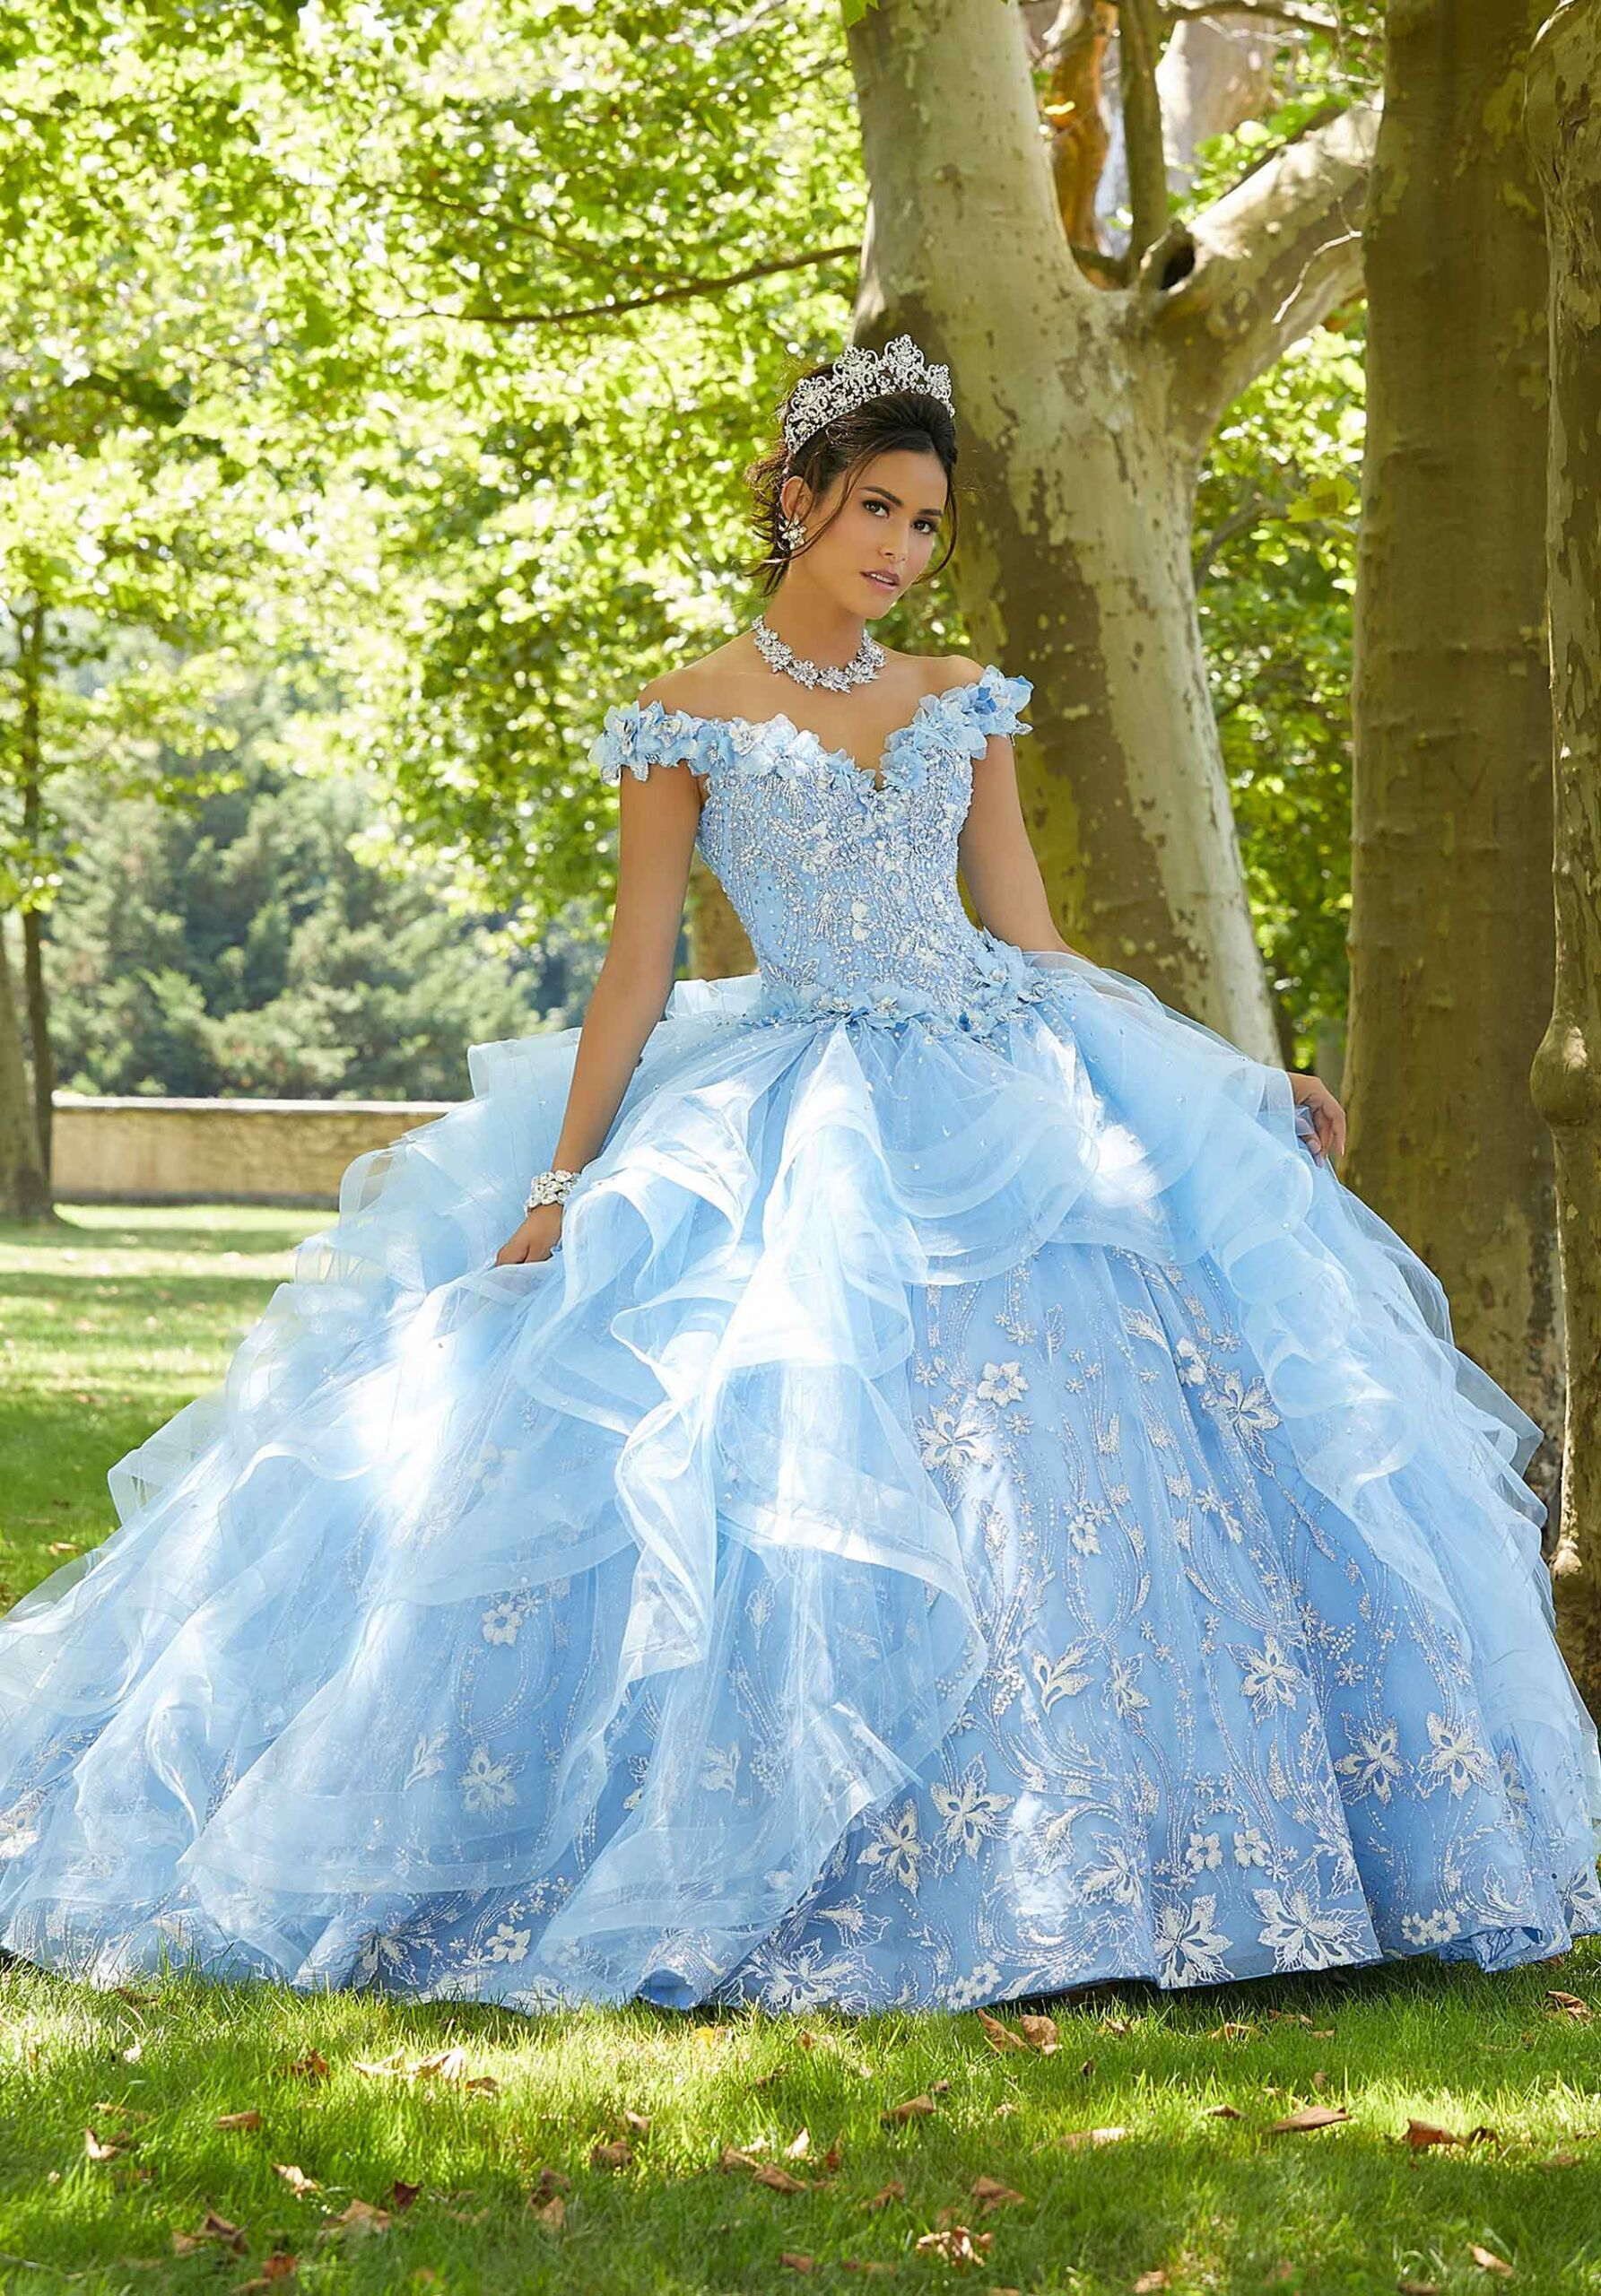 Ruffled Quinceanera Dress By Mori Lee Vizcaya 89303 In 2021 Quinceanera Dresses Pretty Quinceanera Dresses Light Blue Quinceanera Dresses [ 2560 x 1785 Pixel ]